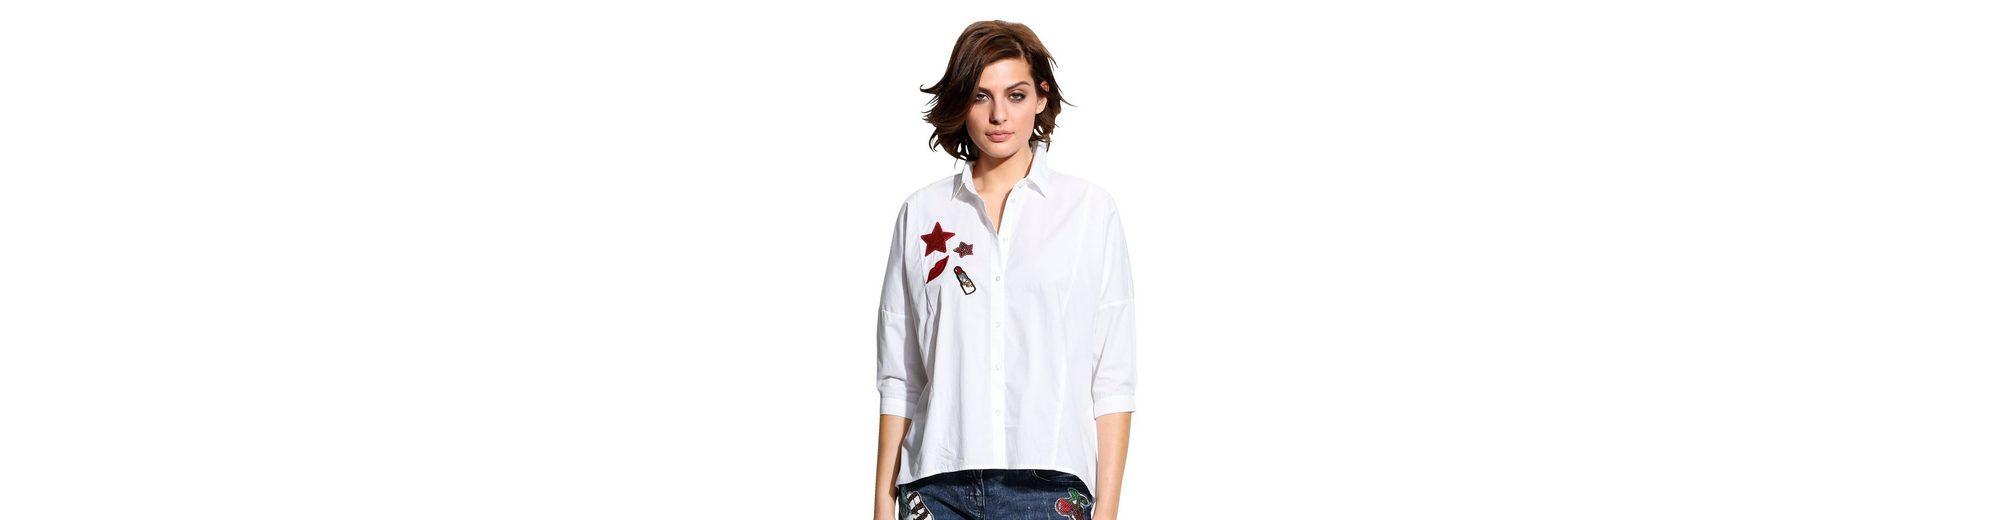 Alba Moda Kimonobluse mit Applikationen Angebote Günstiger Preis 7H5fI2l